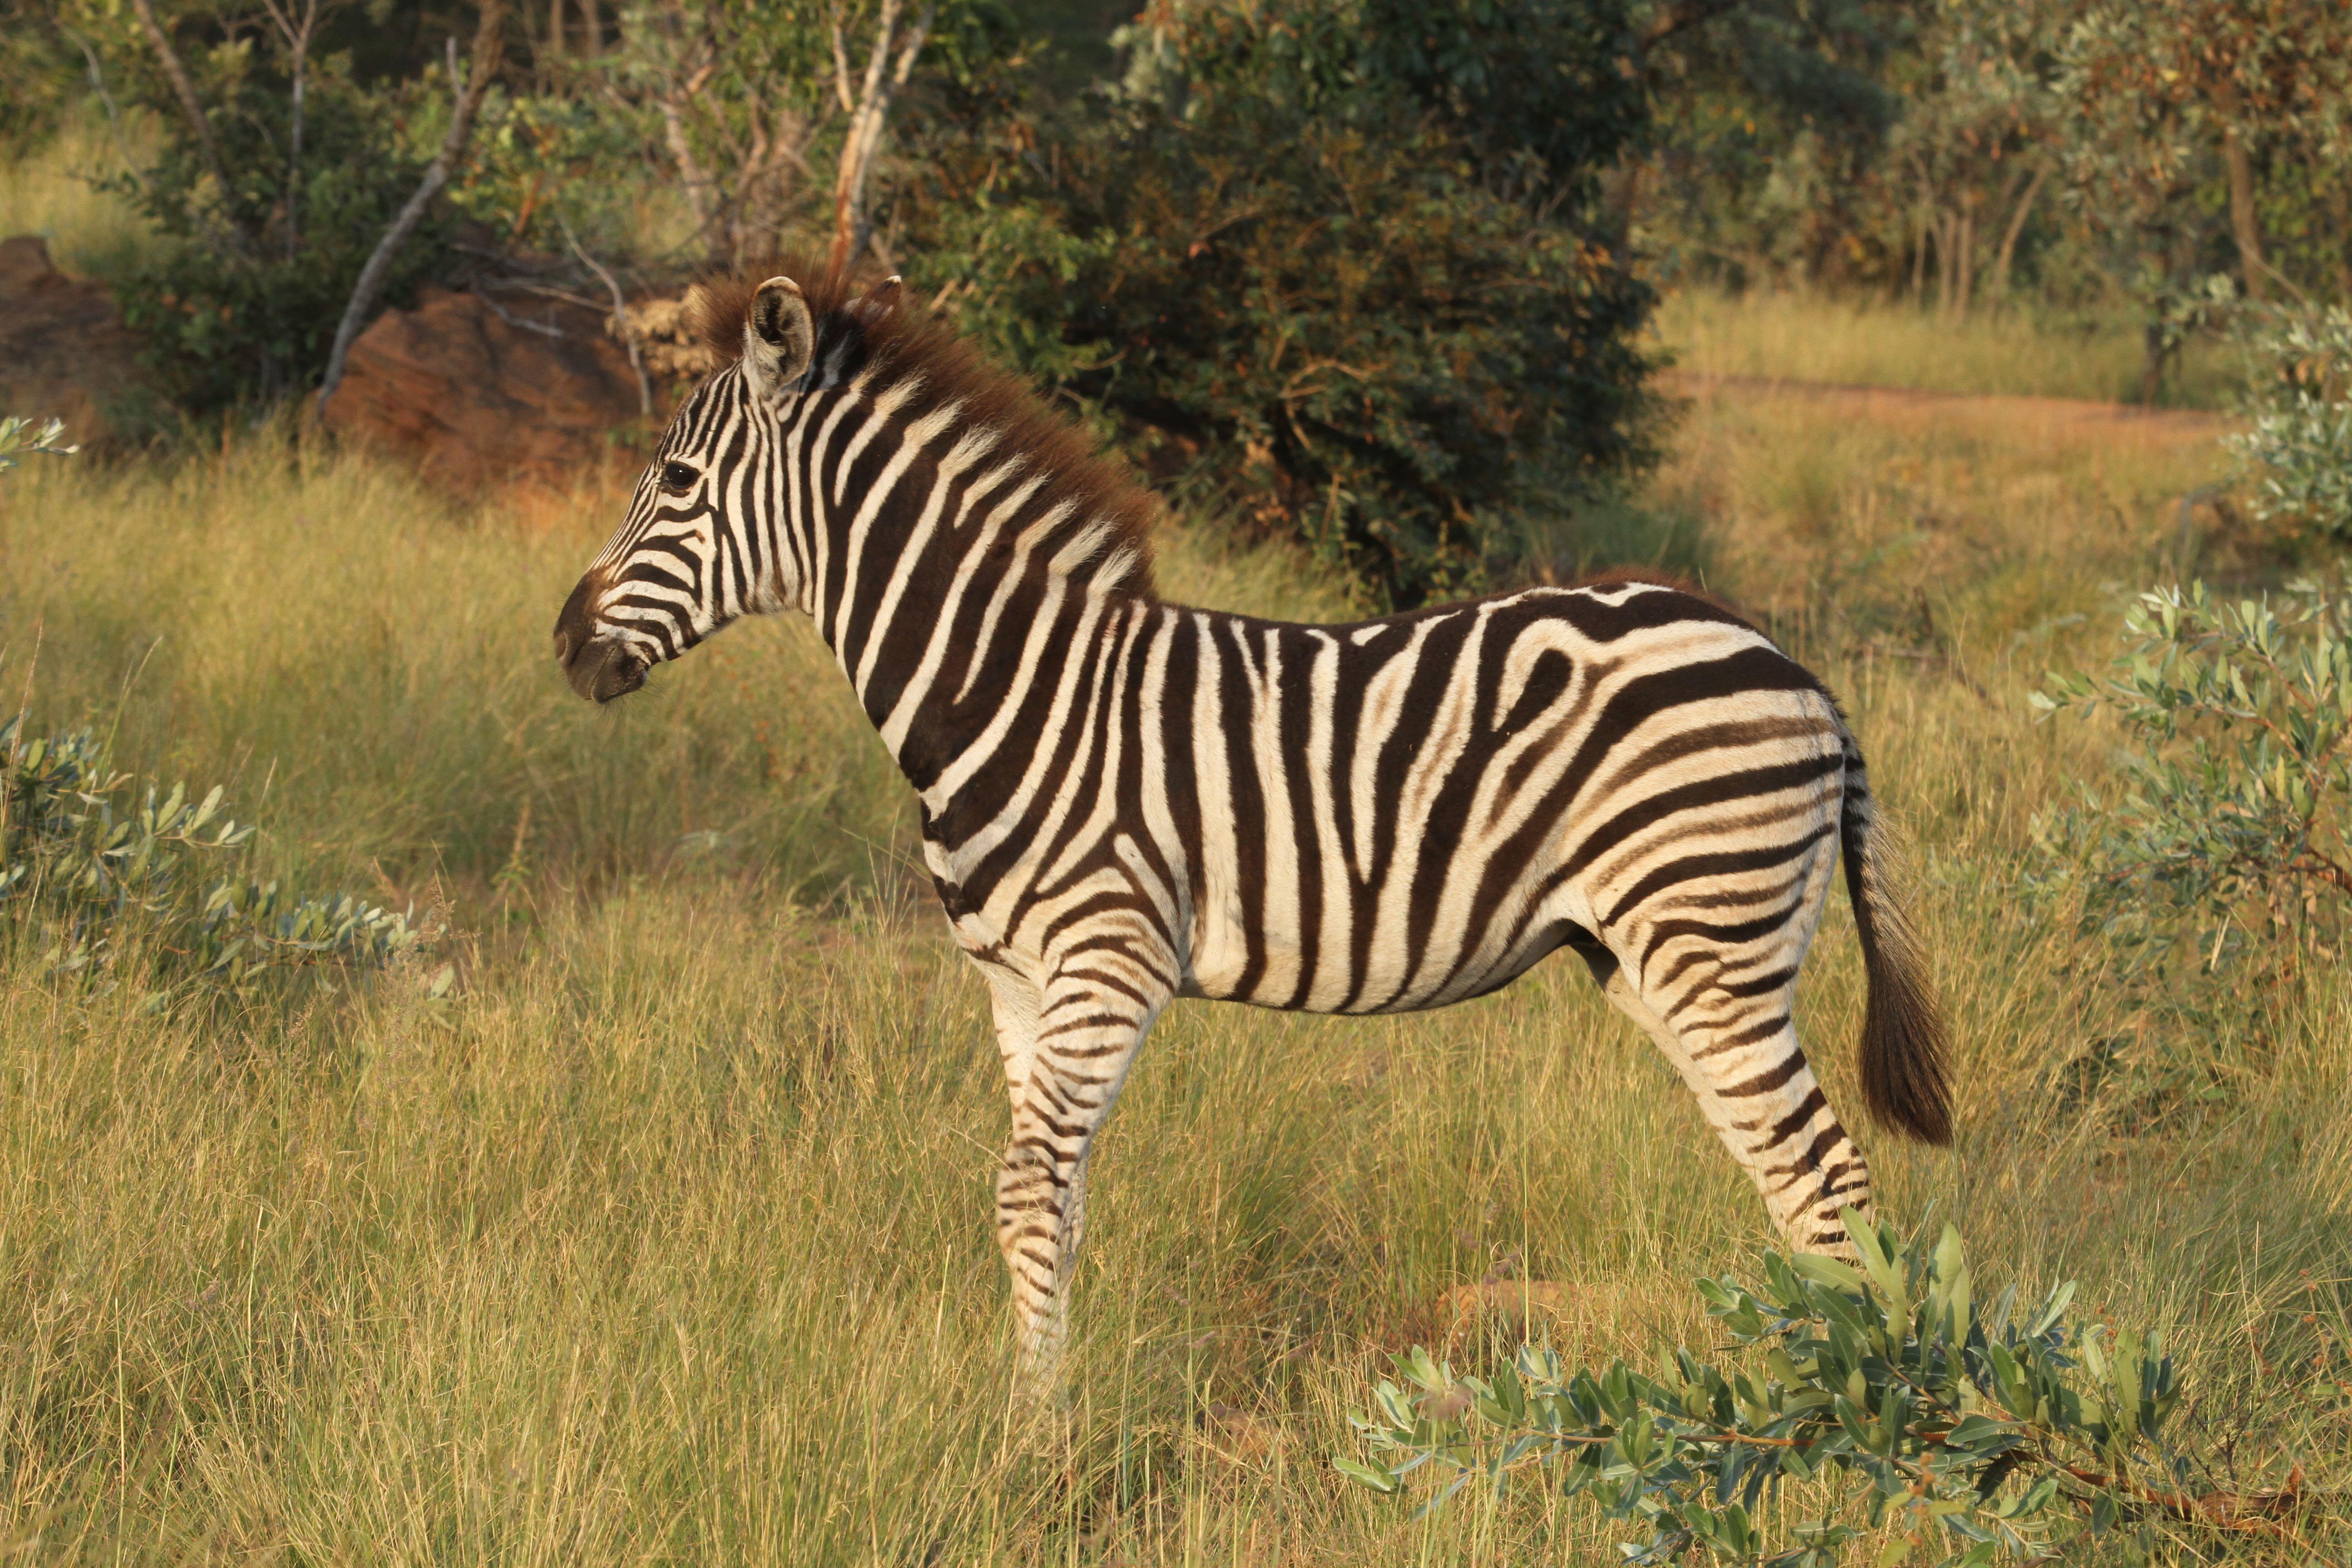 Zebra standing in grass